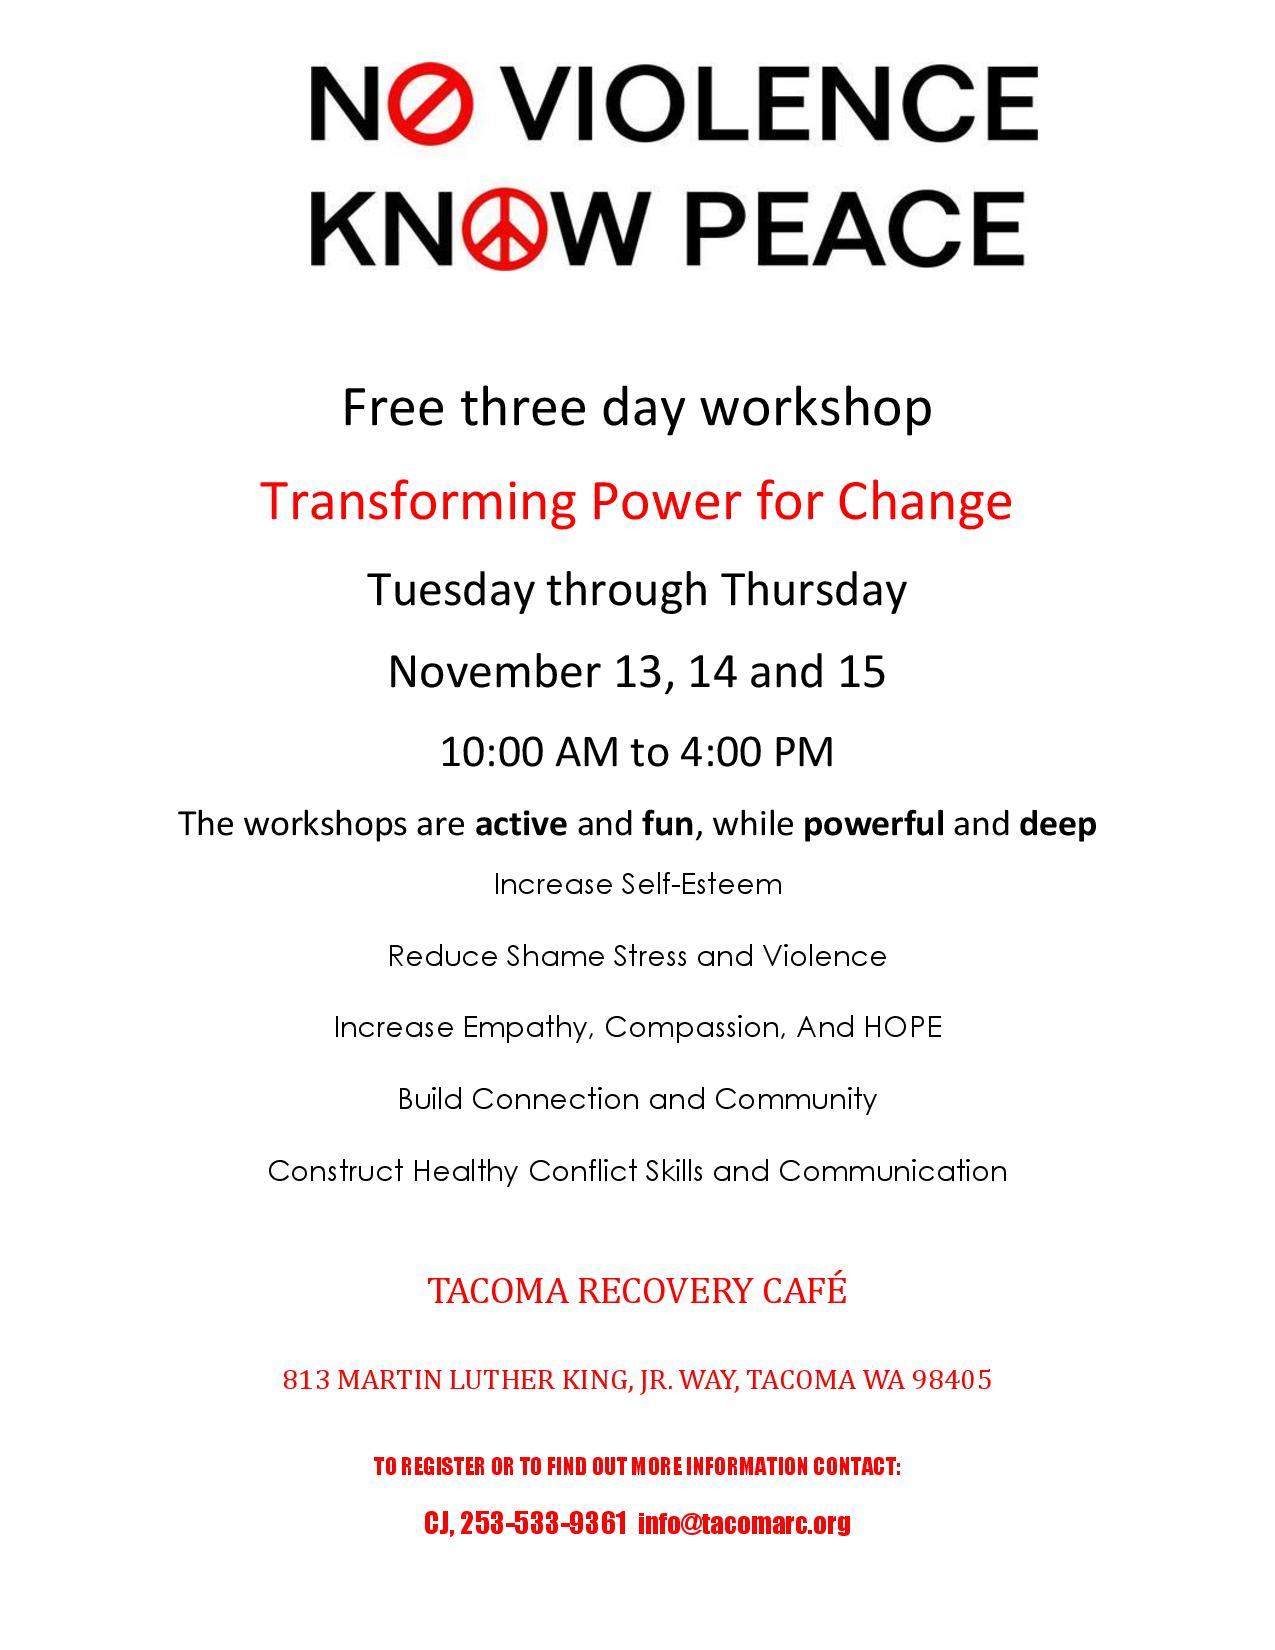 No Violence Know Peace2-page-001.jpg